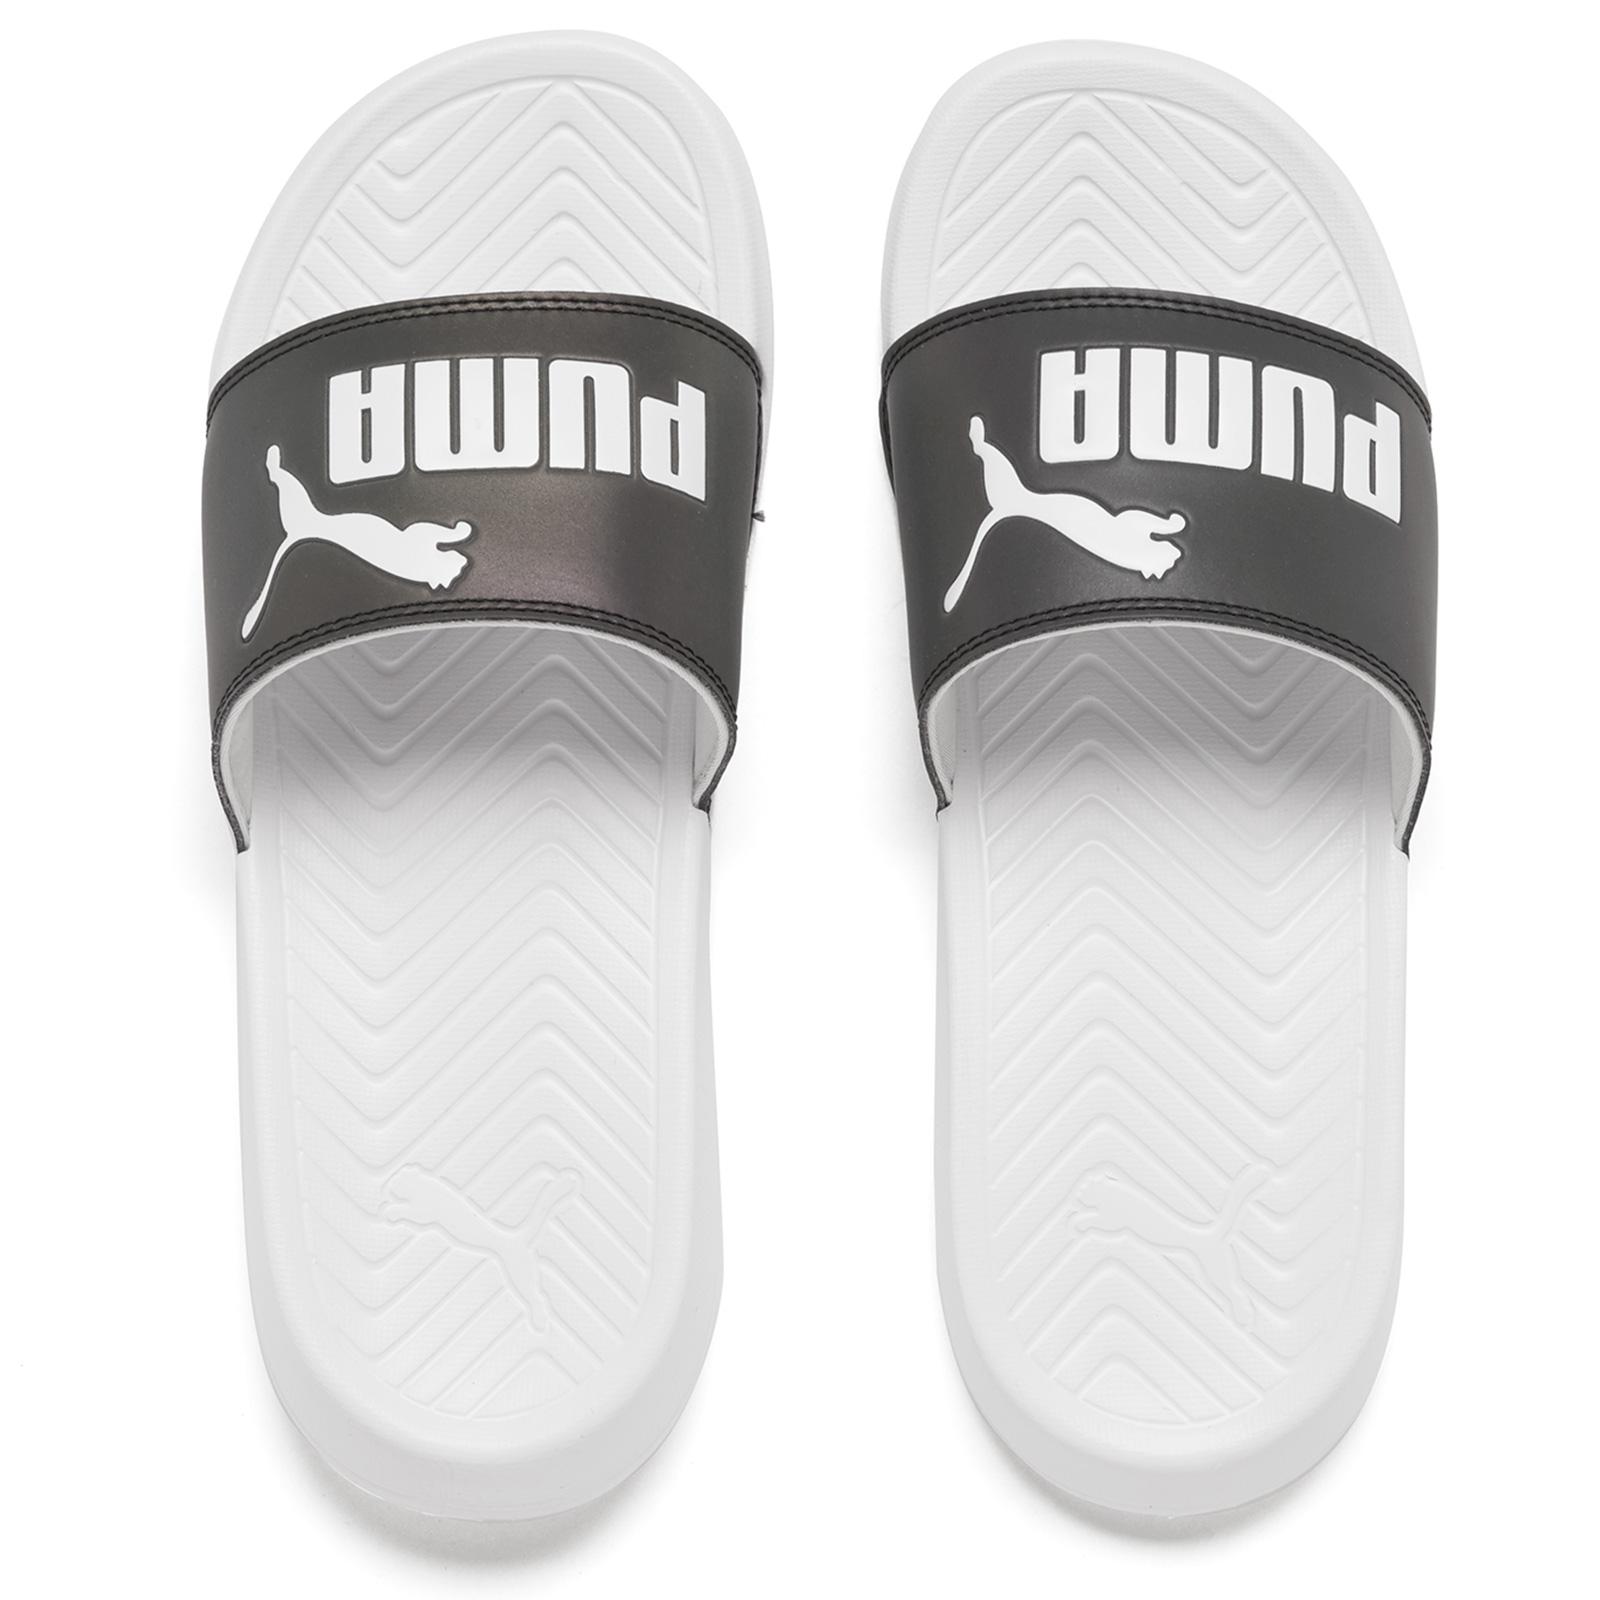 62ad025e6d Puma Women's Popcat Swan Slide Sandals - Puma White